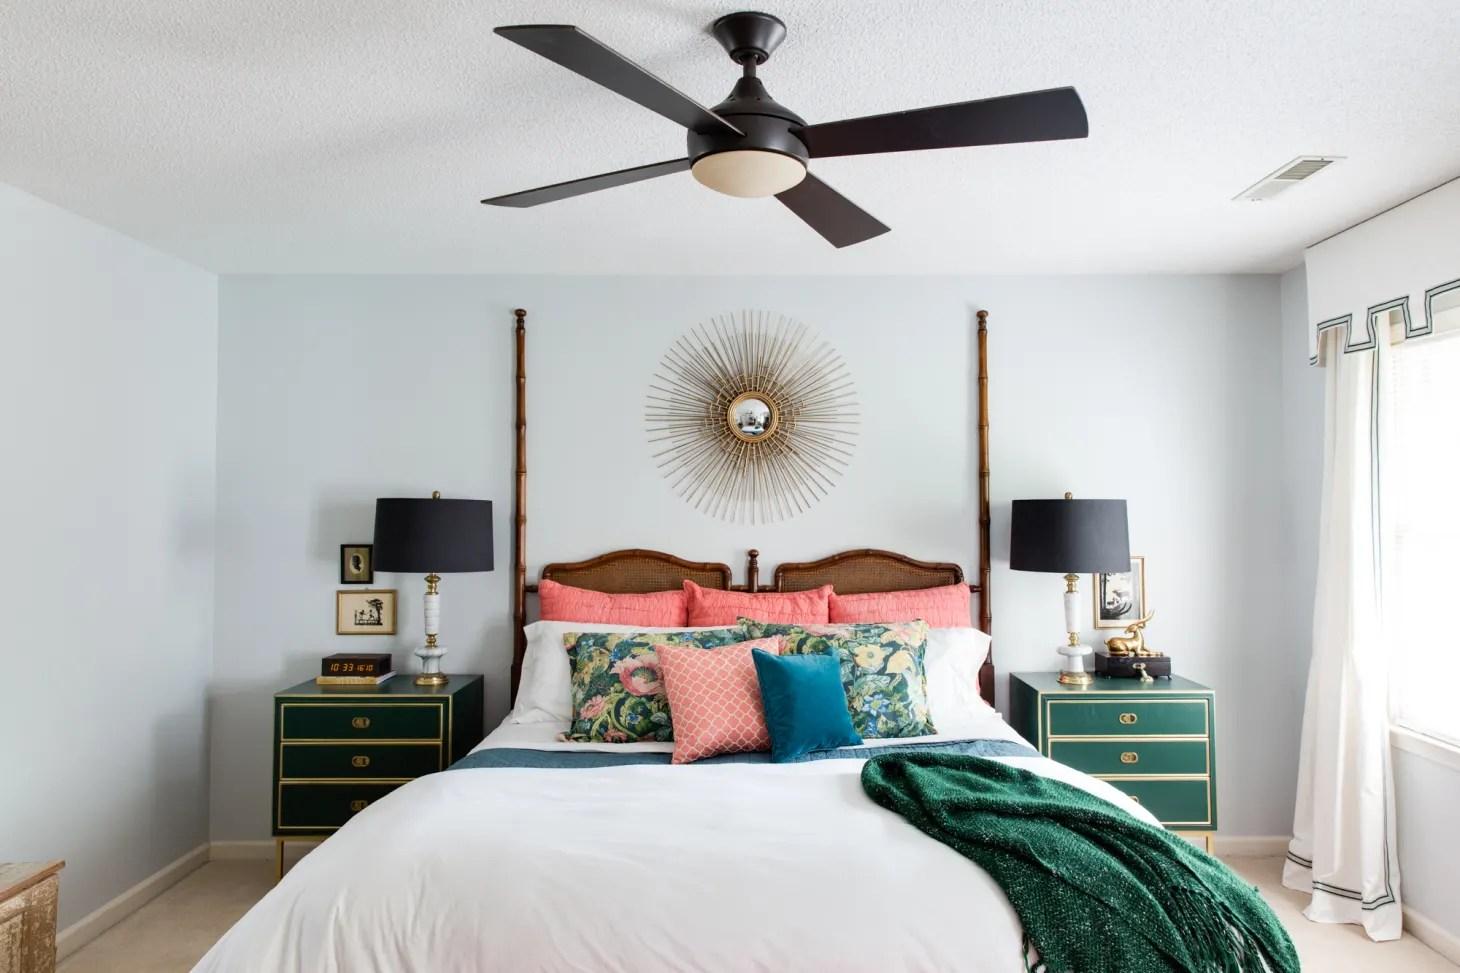 Bedroom Storage Ideas - Small Bedroom Organization ... on Small Apartment Organization  id=11143